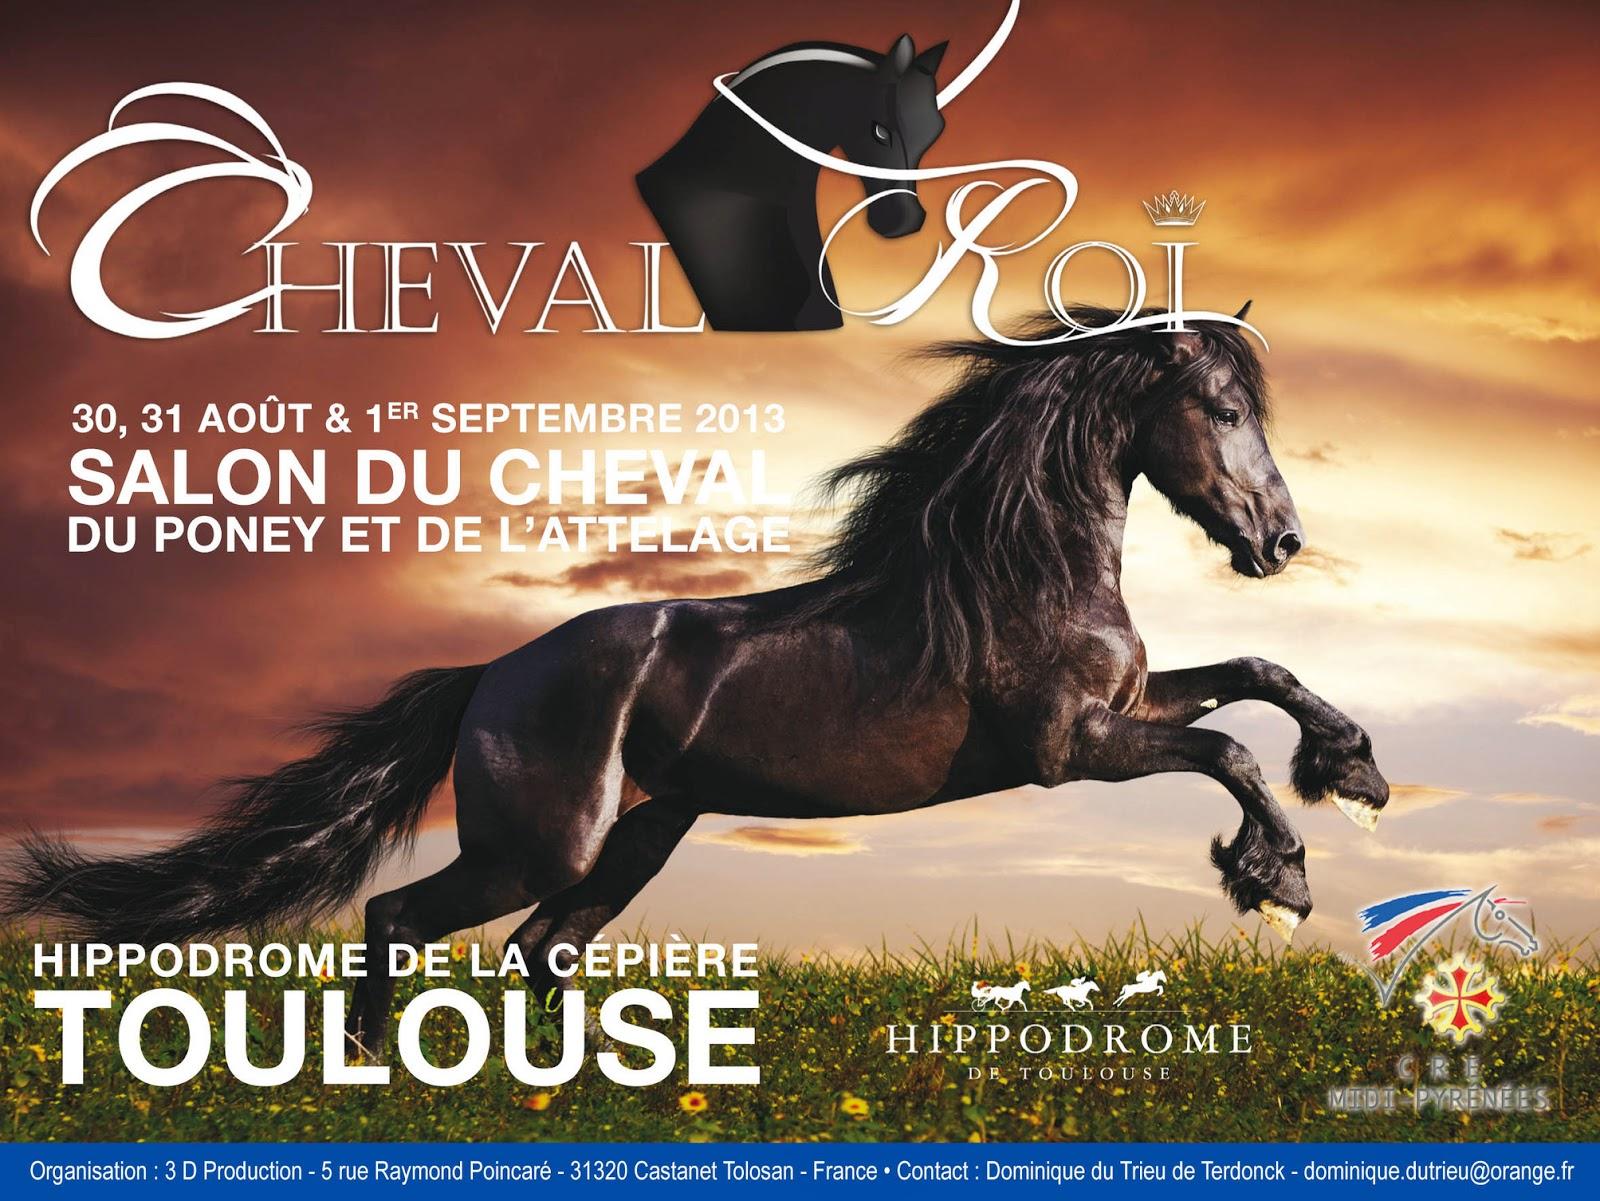 Cheval roi toulouse 2013 cheval compet - Salon cheval toulouse ...